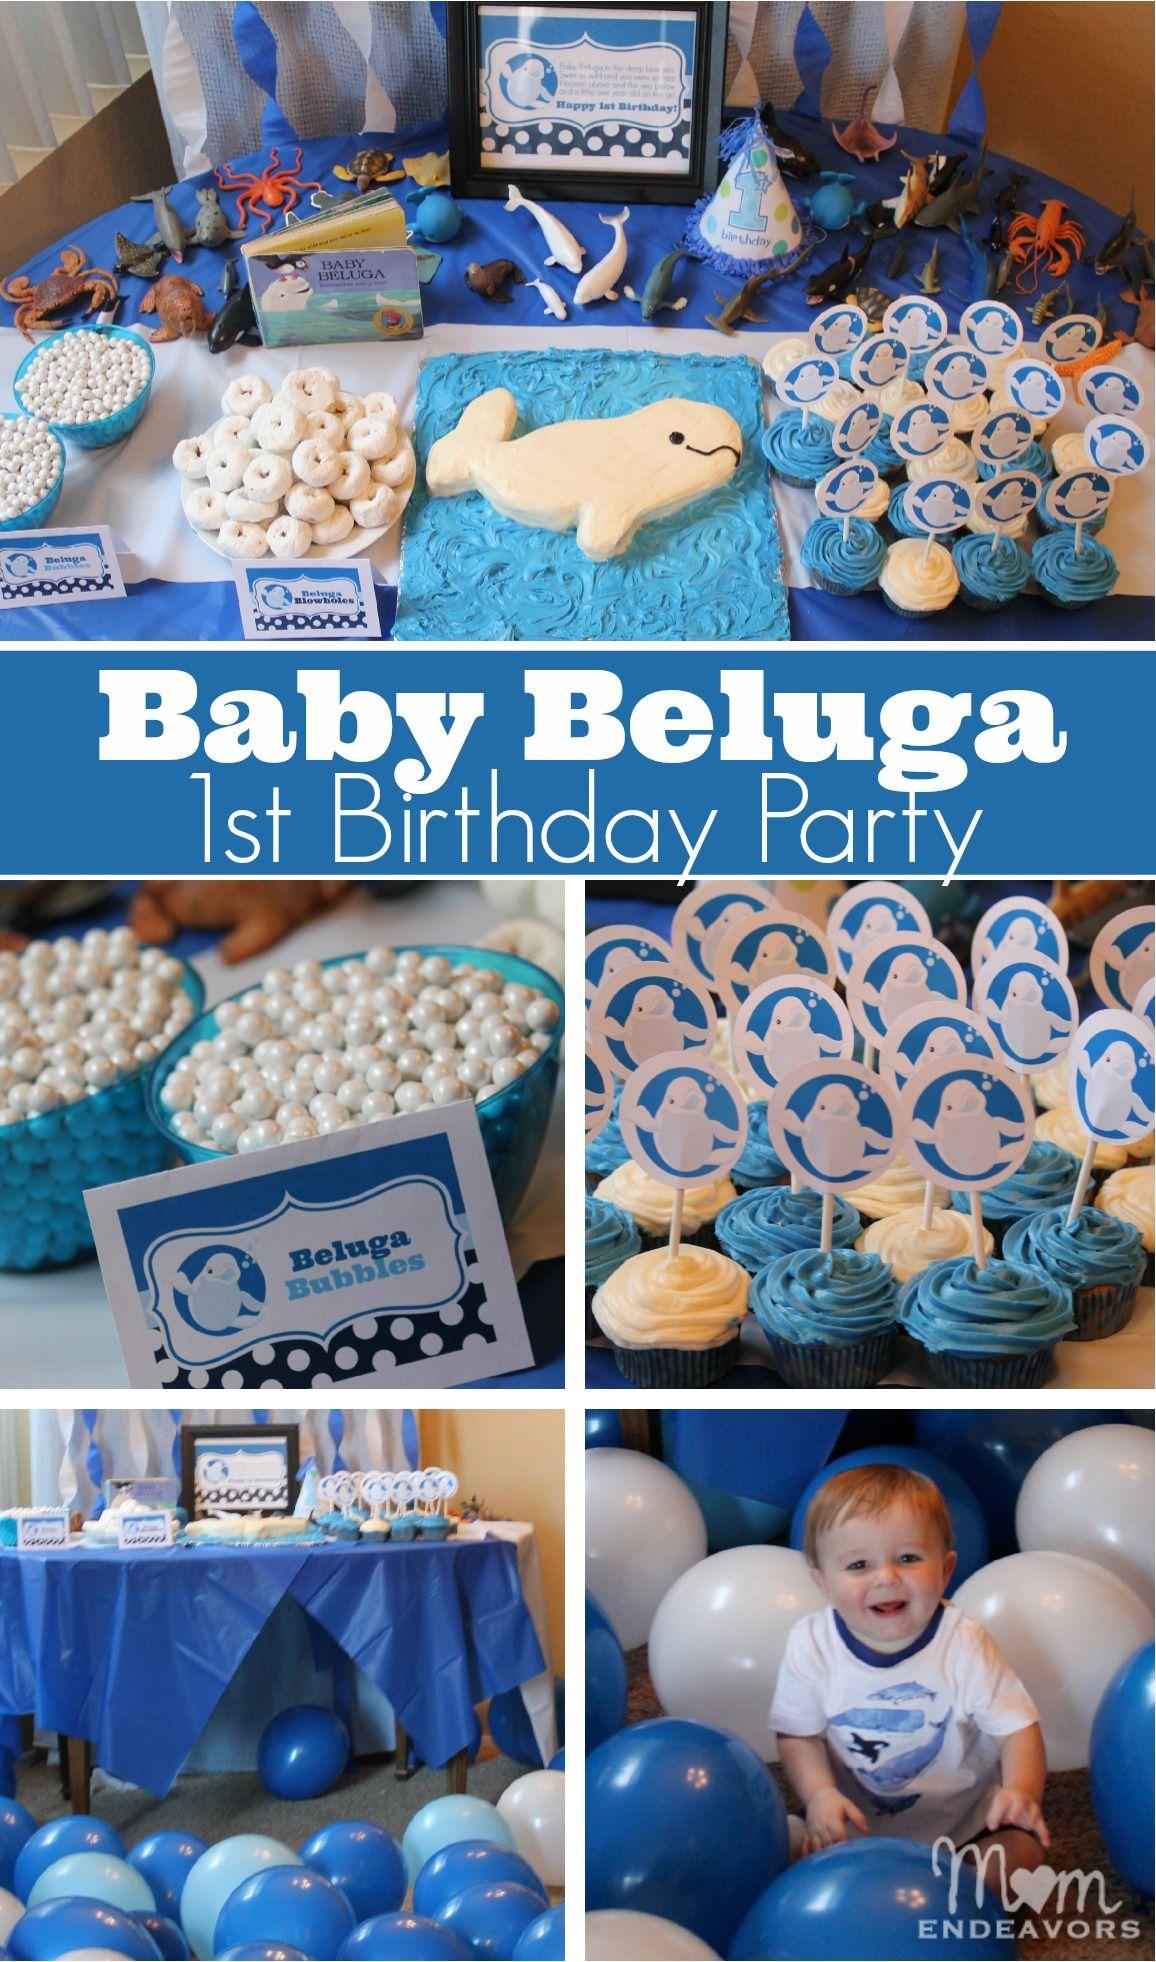 Baby beluga 1st birthday party a fun unique theme